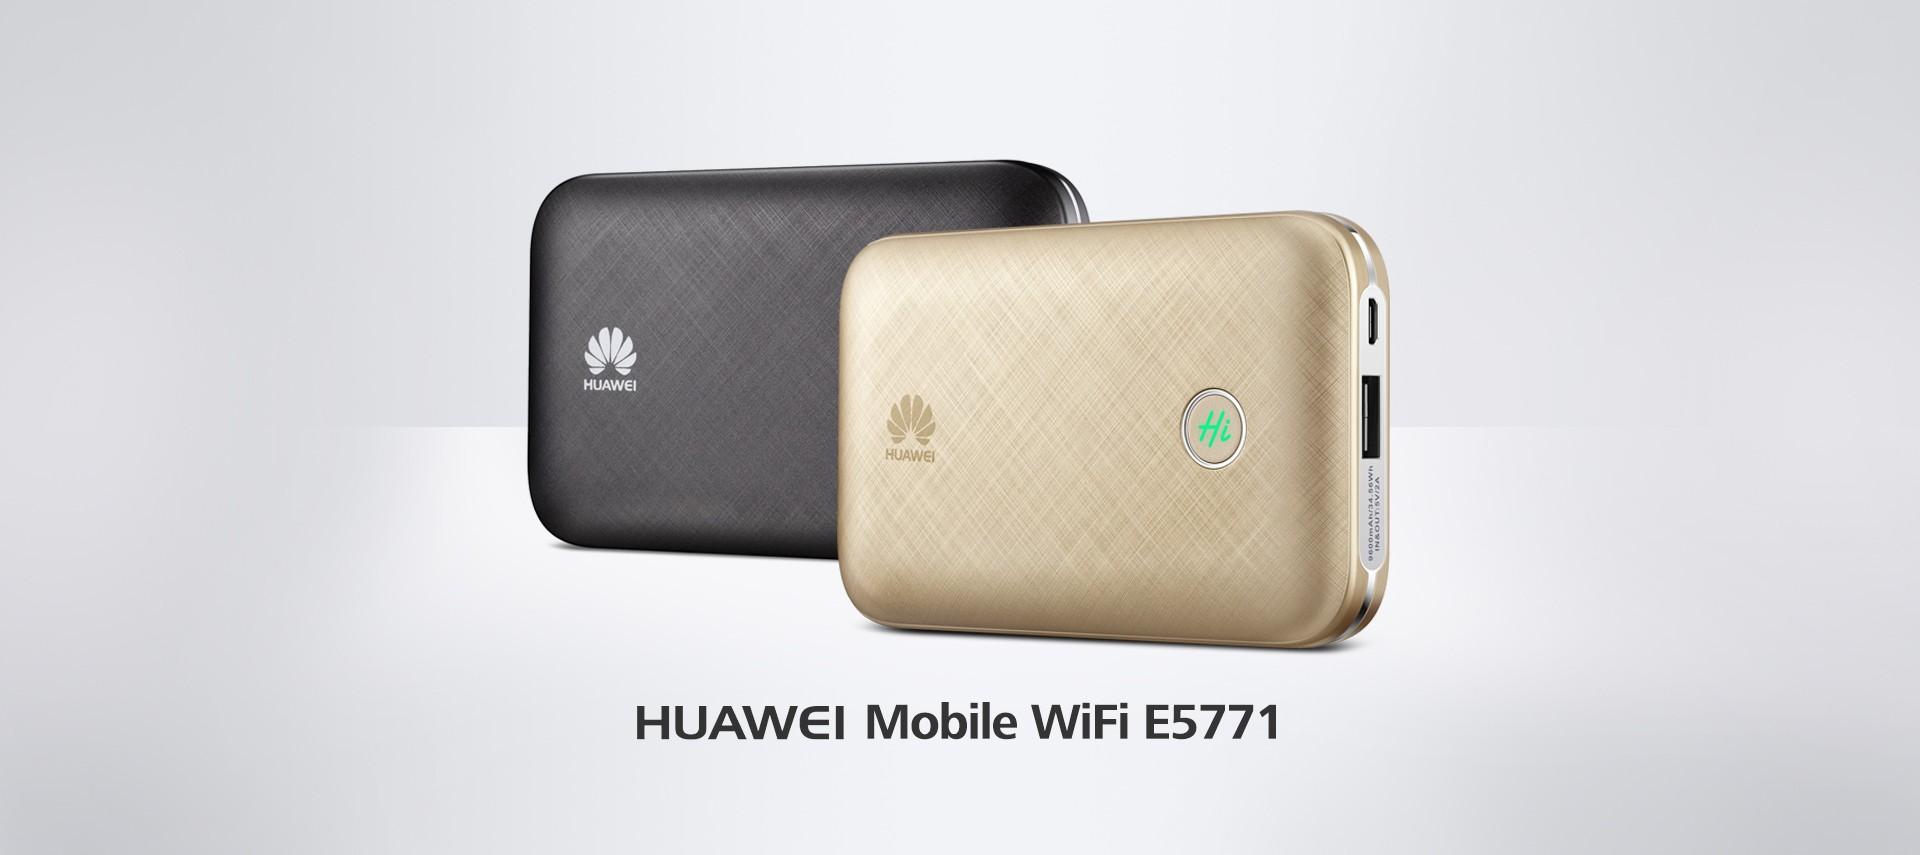 E5771, HUAWEI mobile WIFI, mobile-broadband, WIFI dongle | HUAWEI Global